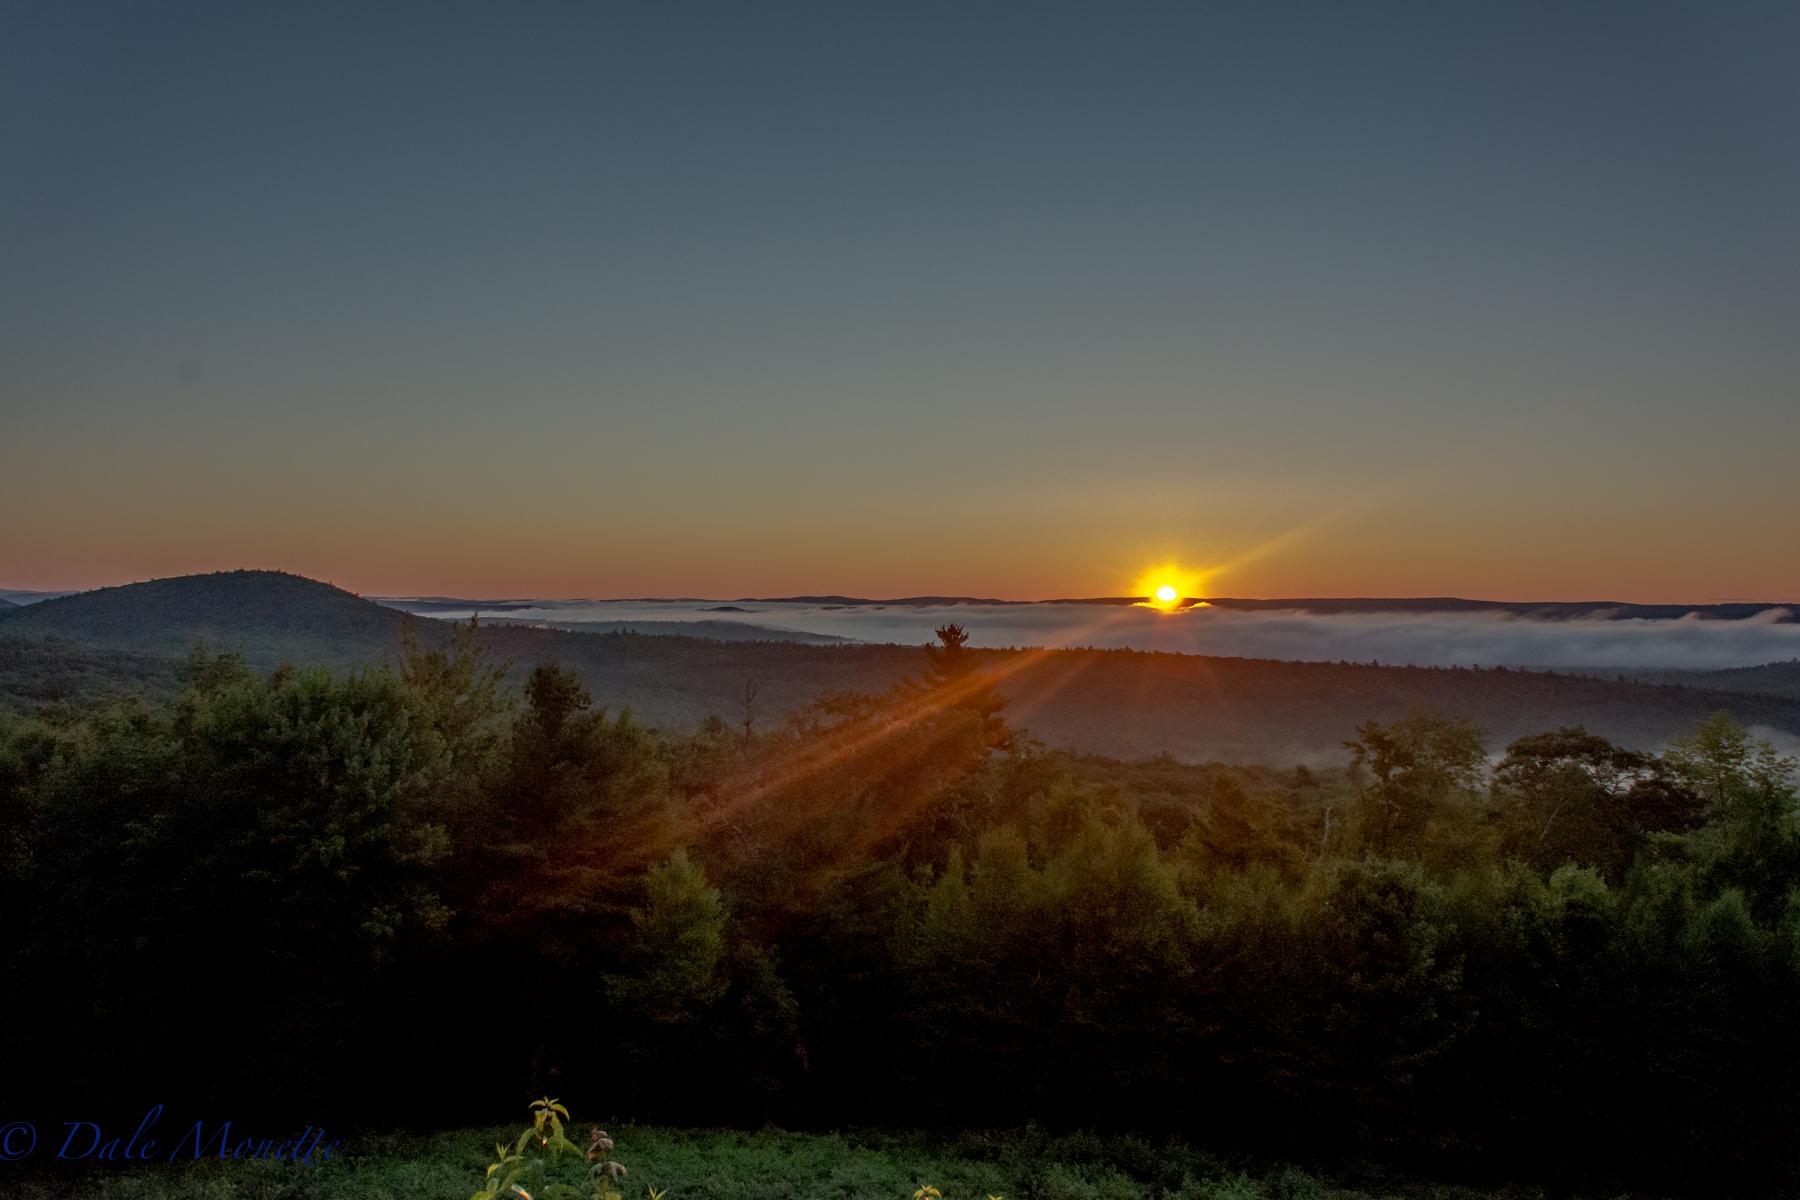 Sunrise, New Salem, MA. North Quabbin...  7/24/16